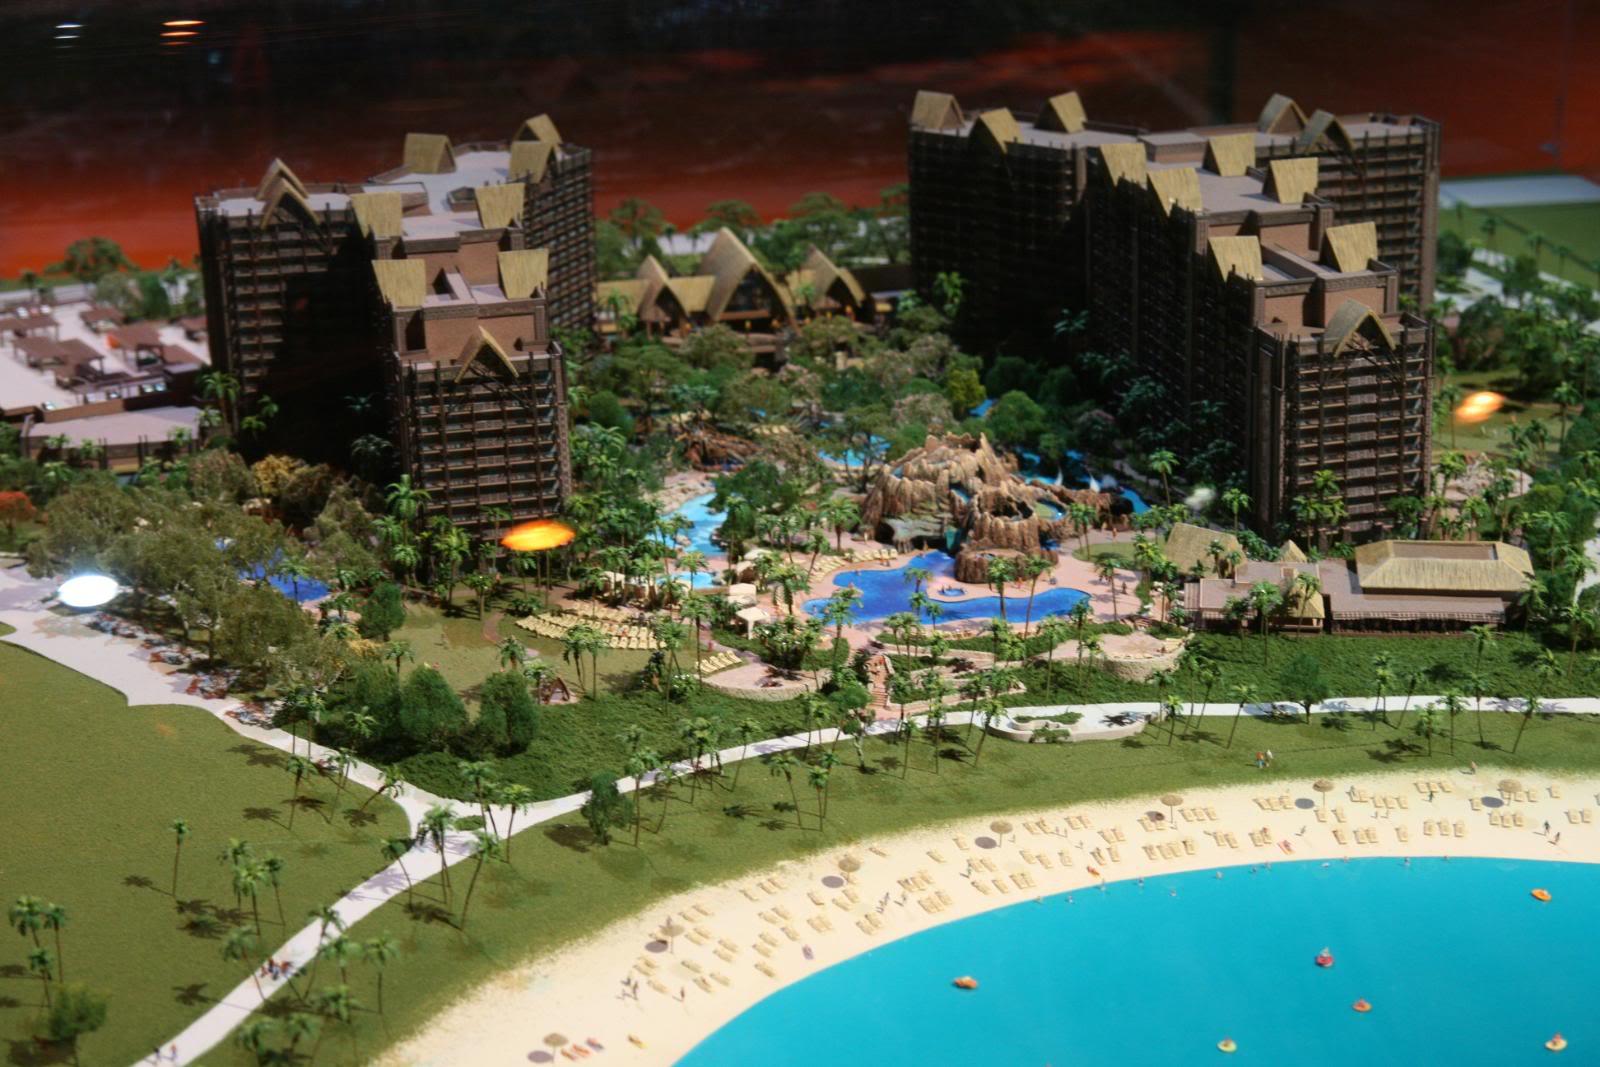 [Disney Vacation Club] Aulani, a Disney Resort & Spa (29 août 2011) - Page 2 IMG_9479